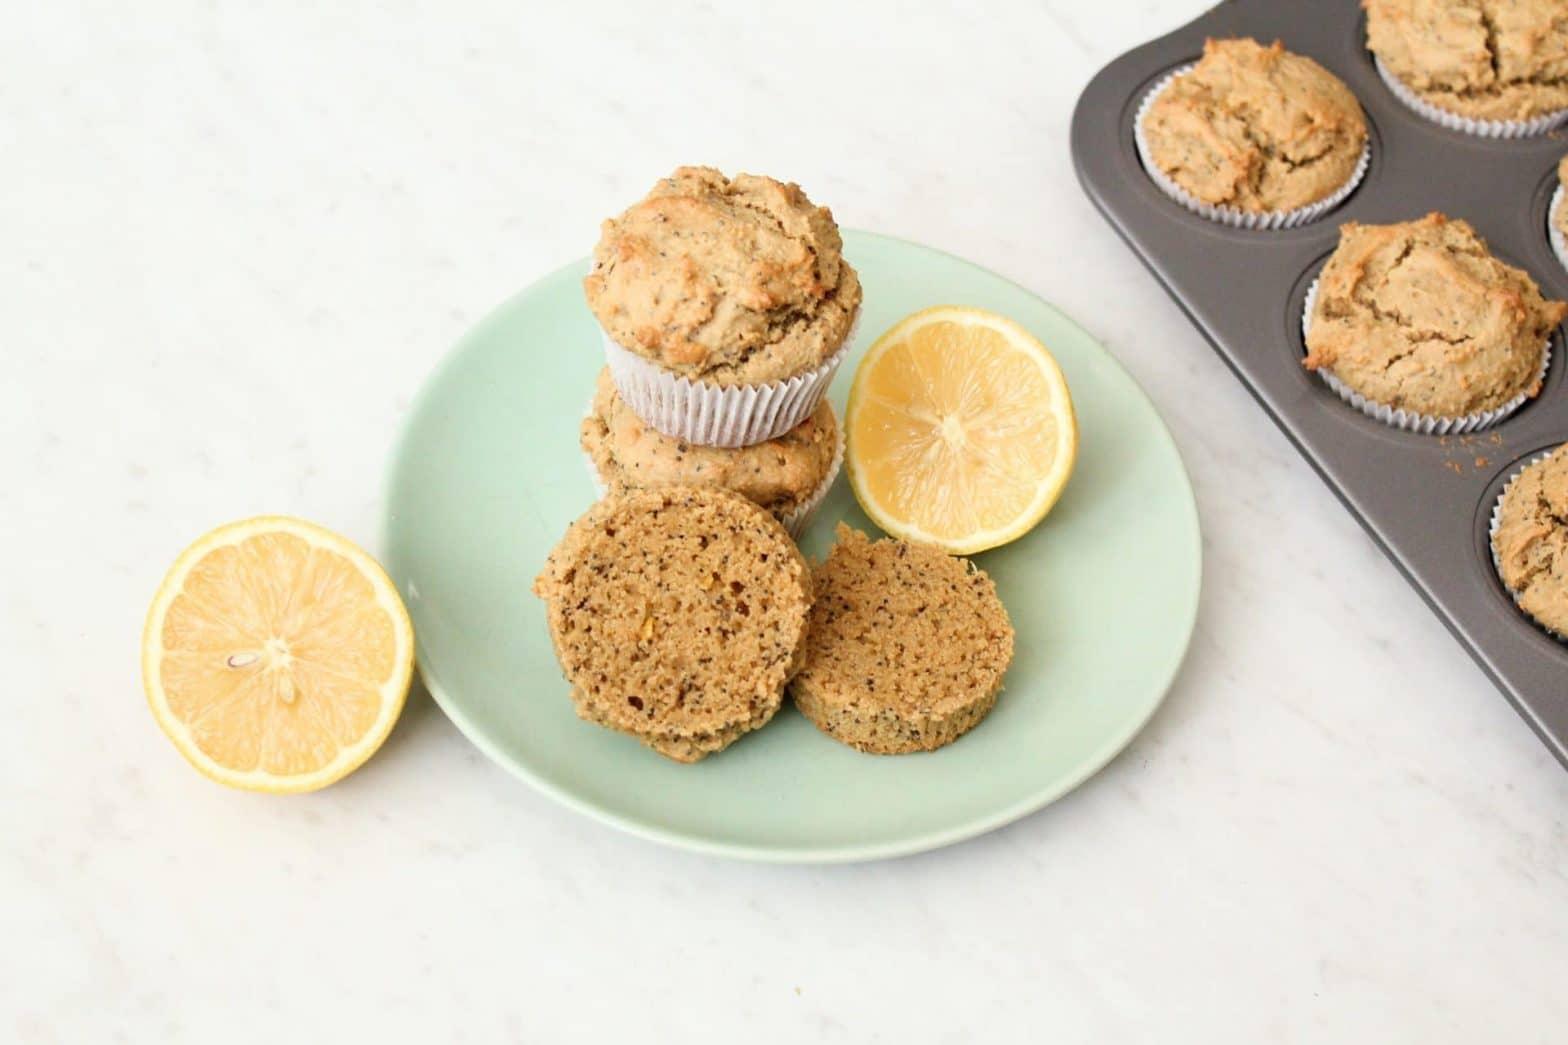 Paleo Lemon Poppy Seed Muffins Recipe (Gluten Free + Grain Free)